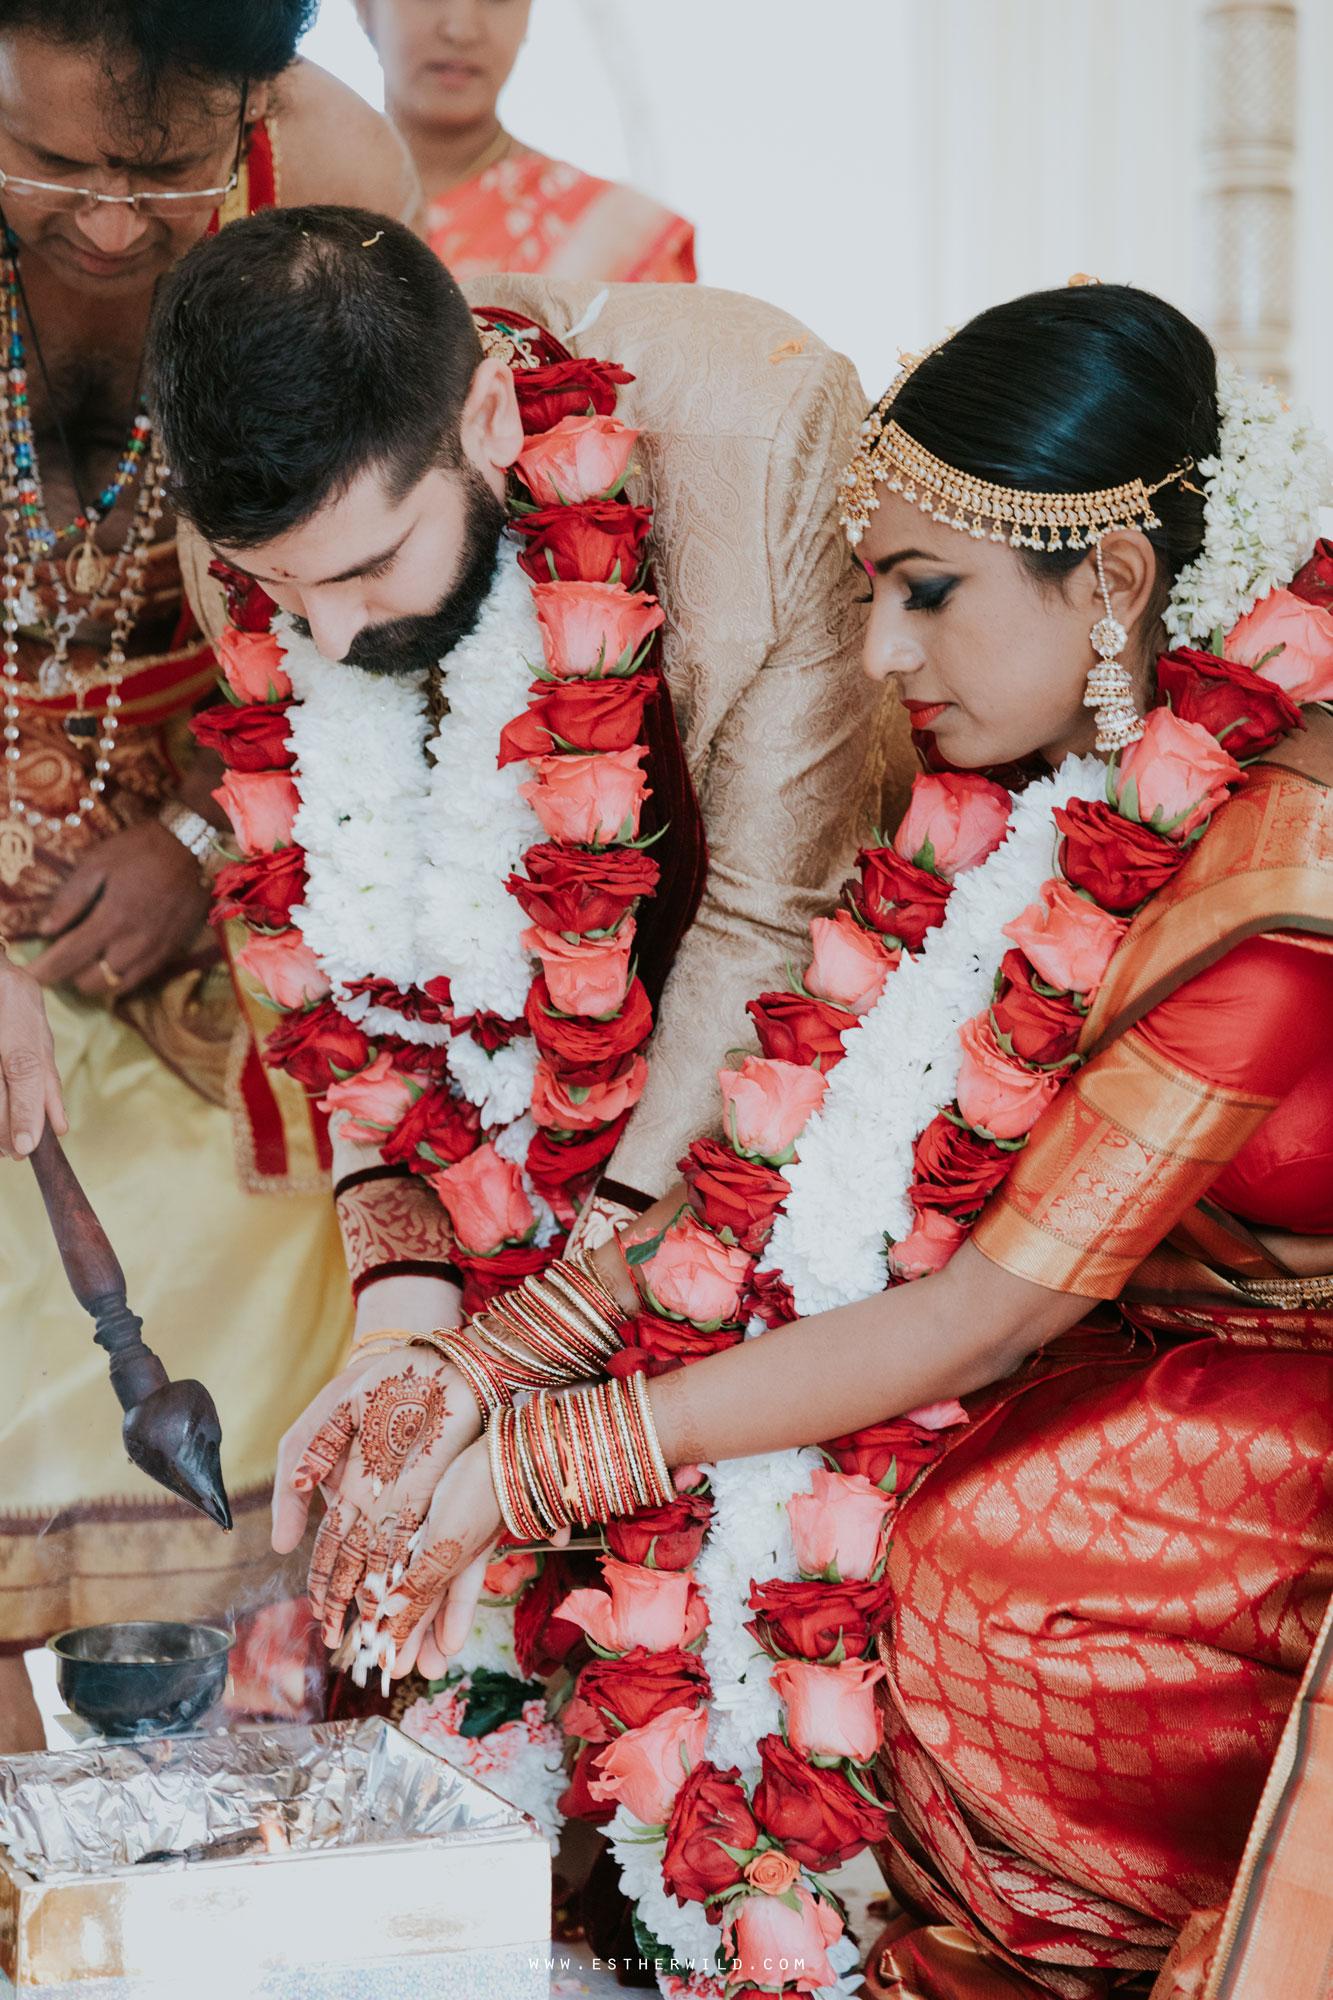 Northbrook_Park_Farnham_Surrey_London_Wedding_Hindu_Fusion_Esther_Wild_Photographer_IMG_4744.jpg